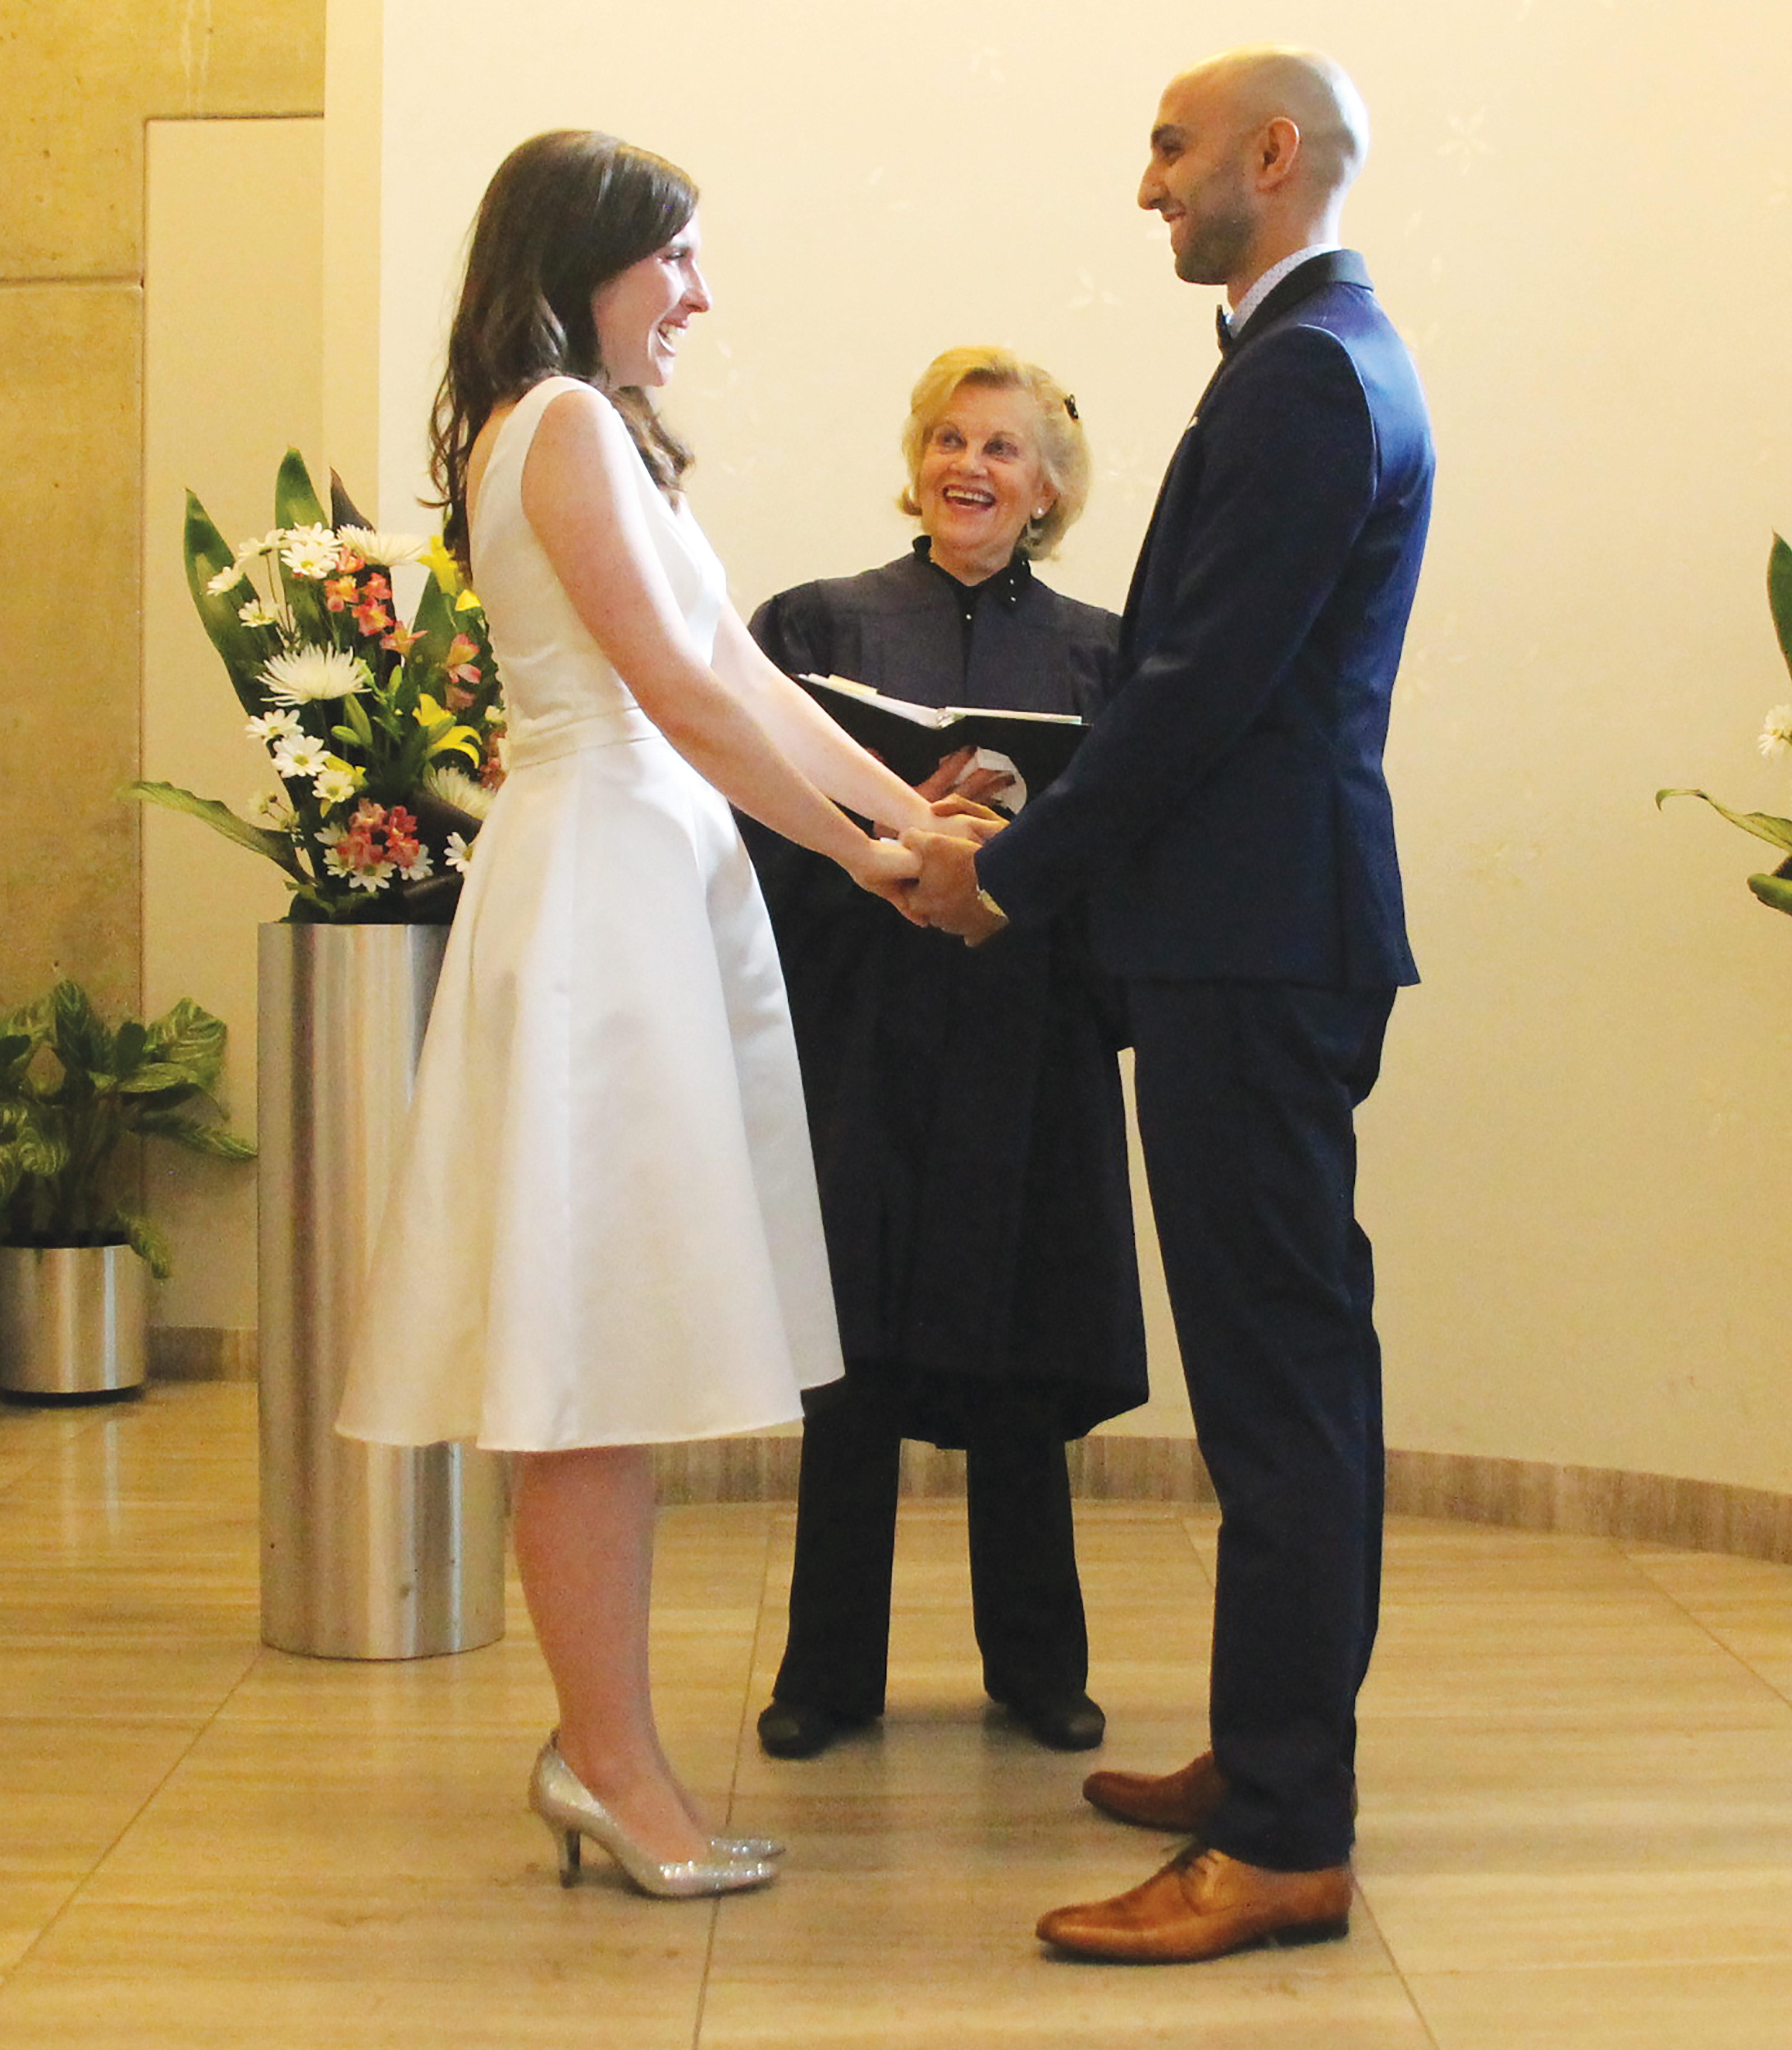 Jackson and Yousefian getting married at city hall. Courtesy Samatha Jackson.